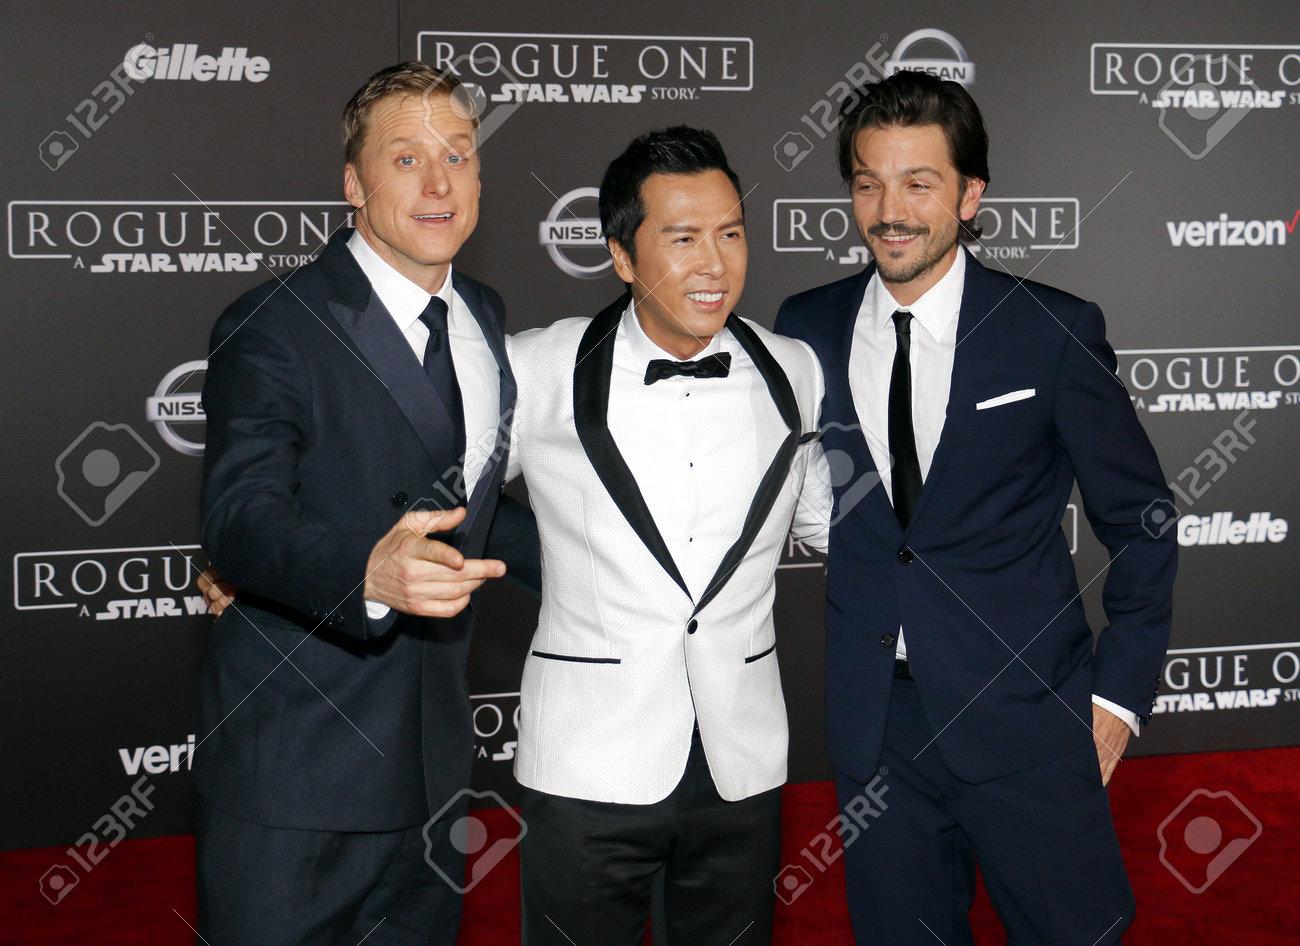 Alan Tudyk, Donnie Yen and Diego Luna at the World premiere of..